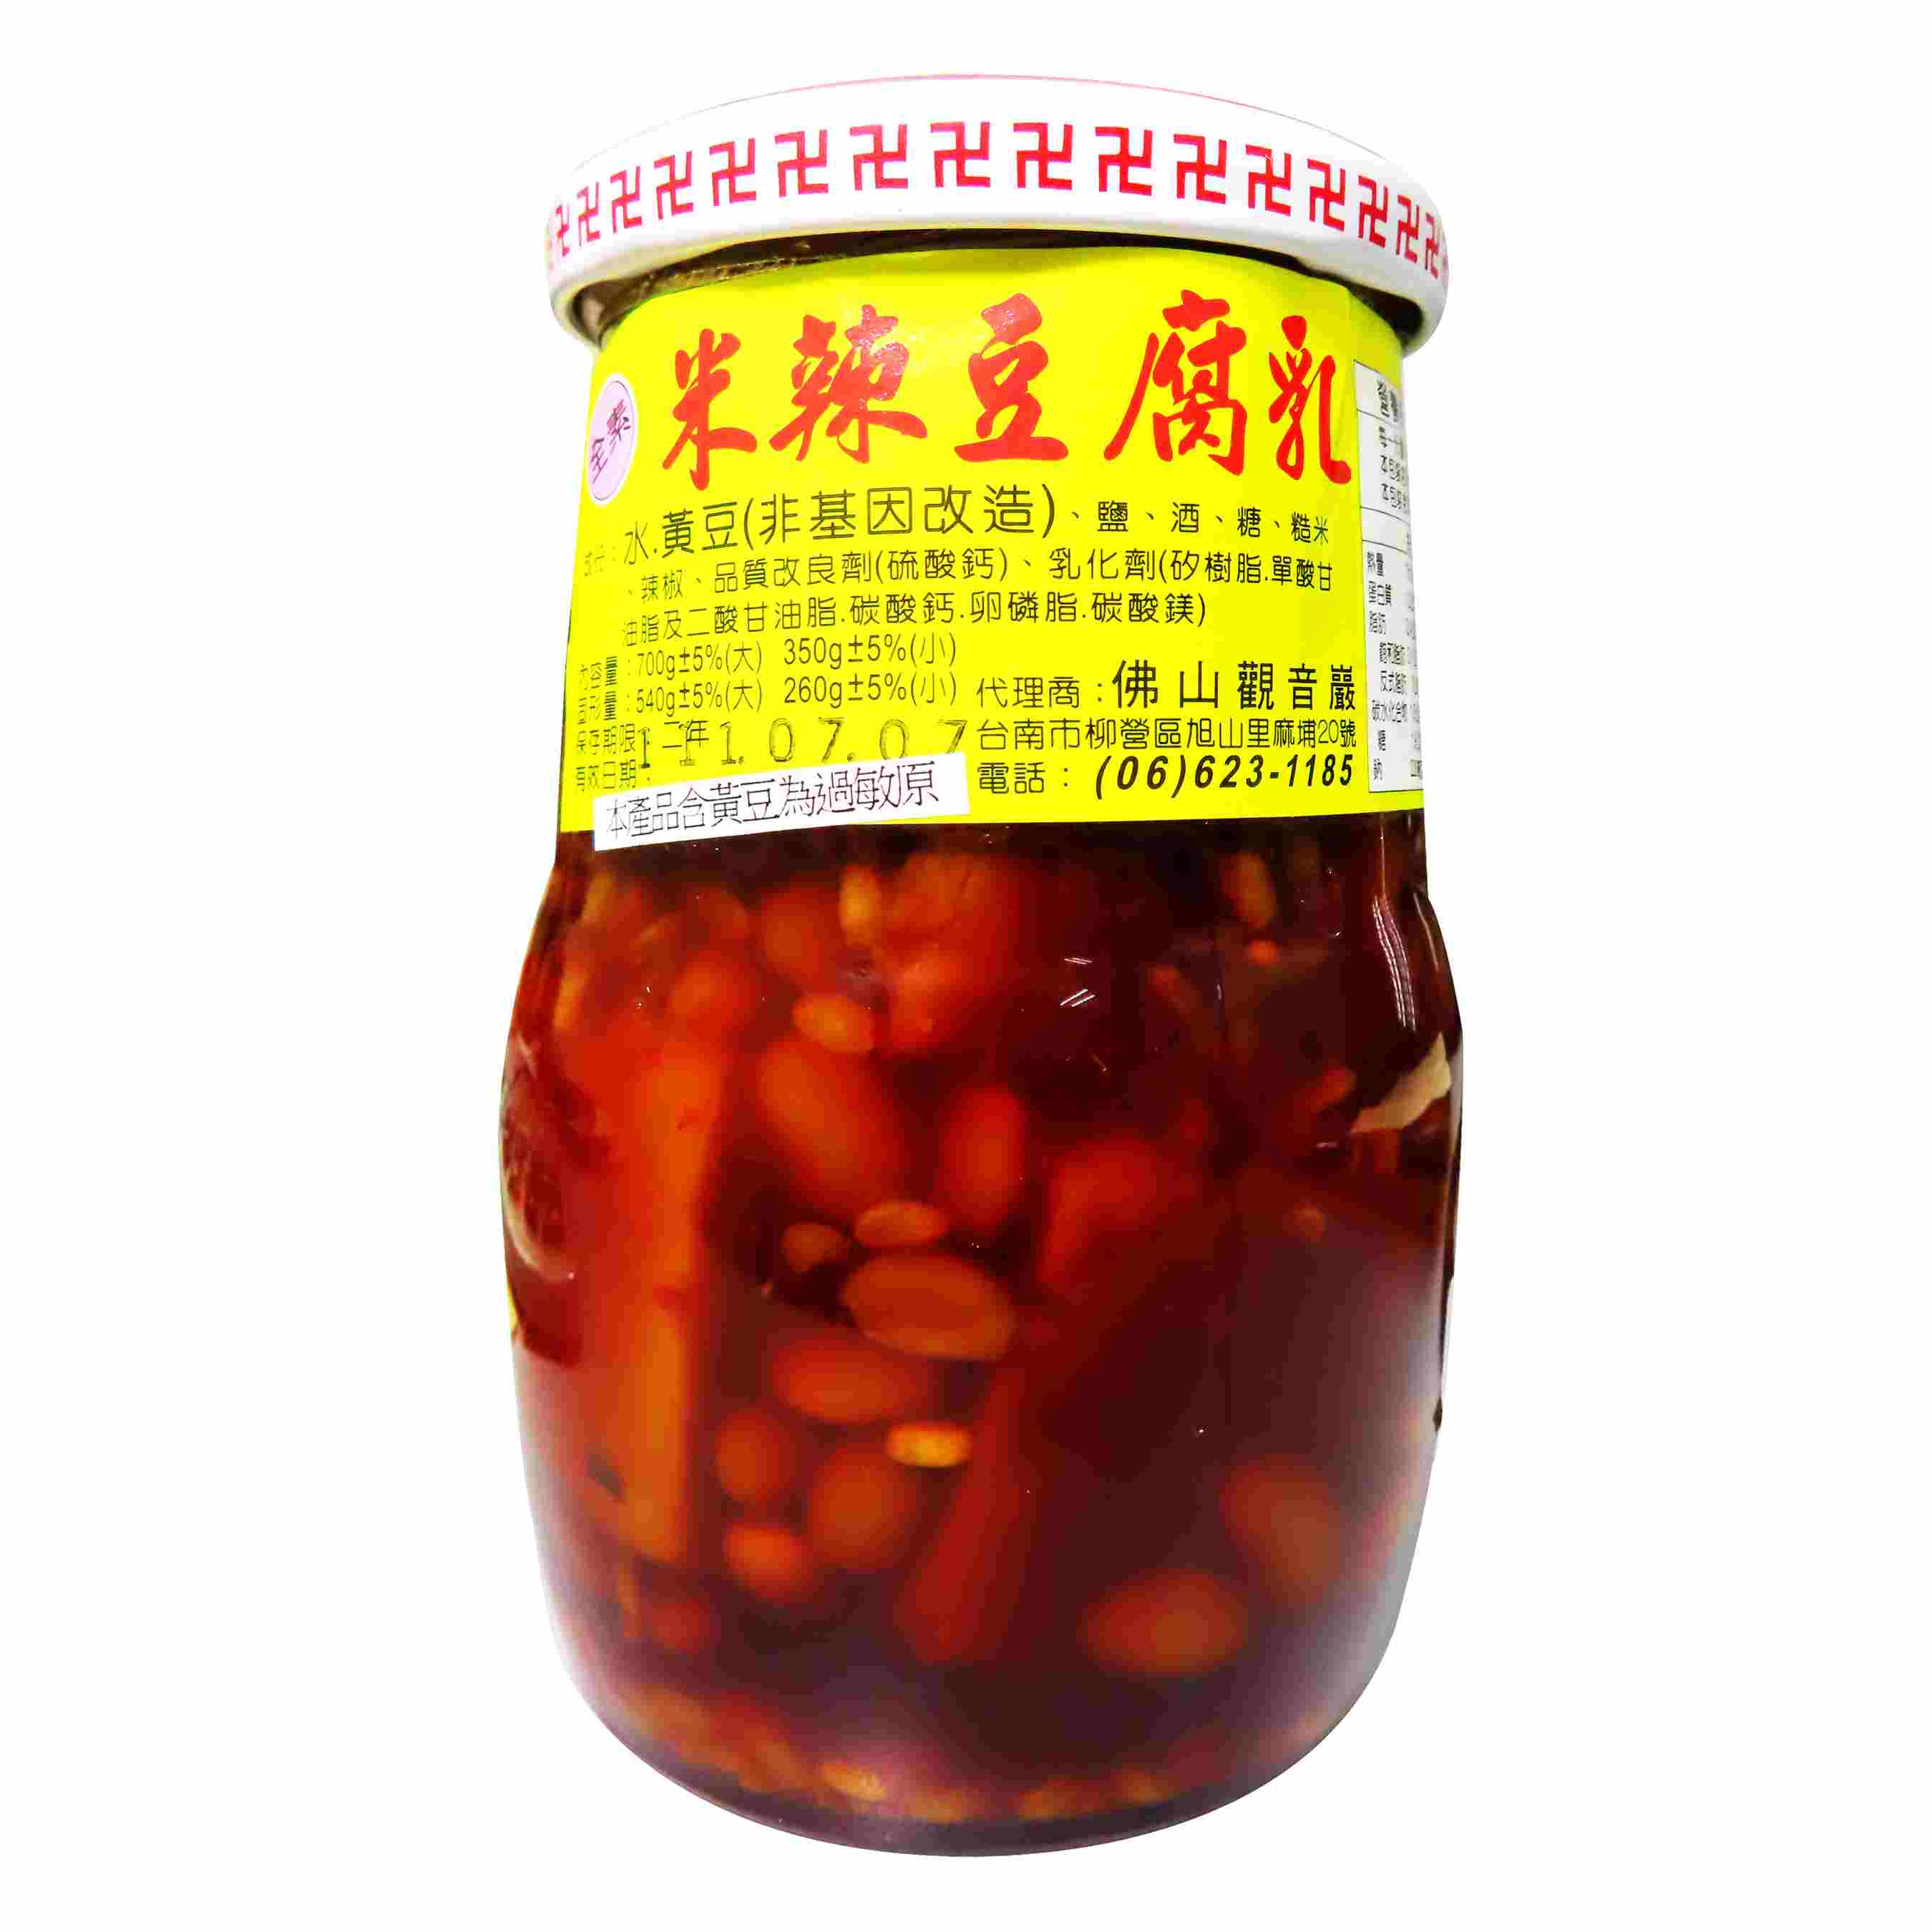 Image Bean Curd With Chili 佛山观音嚴 - 米辣豆腐乳 400grams